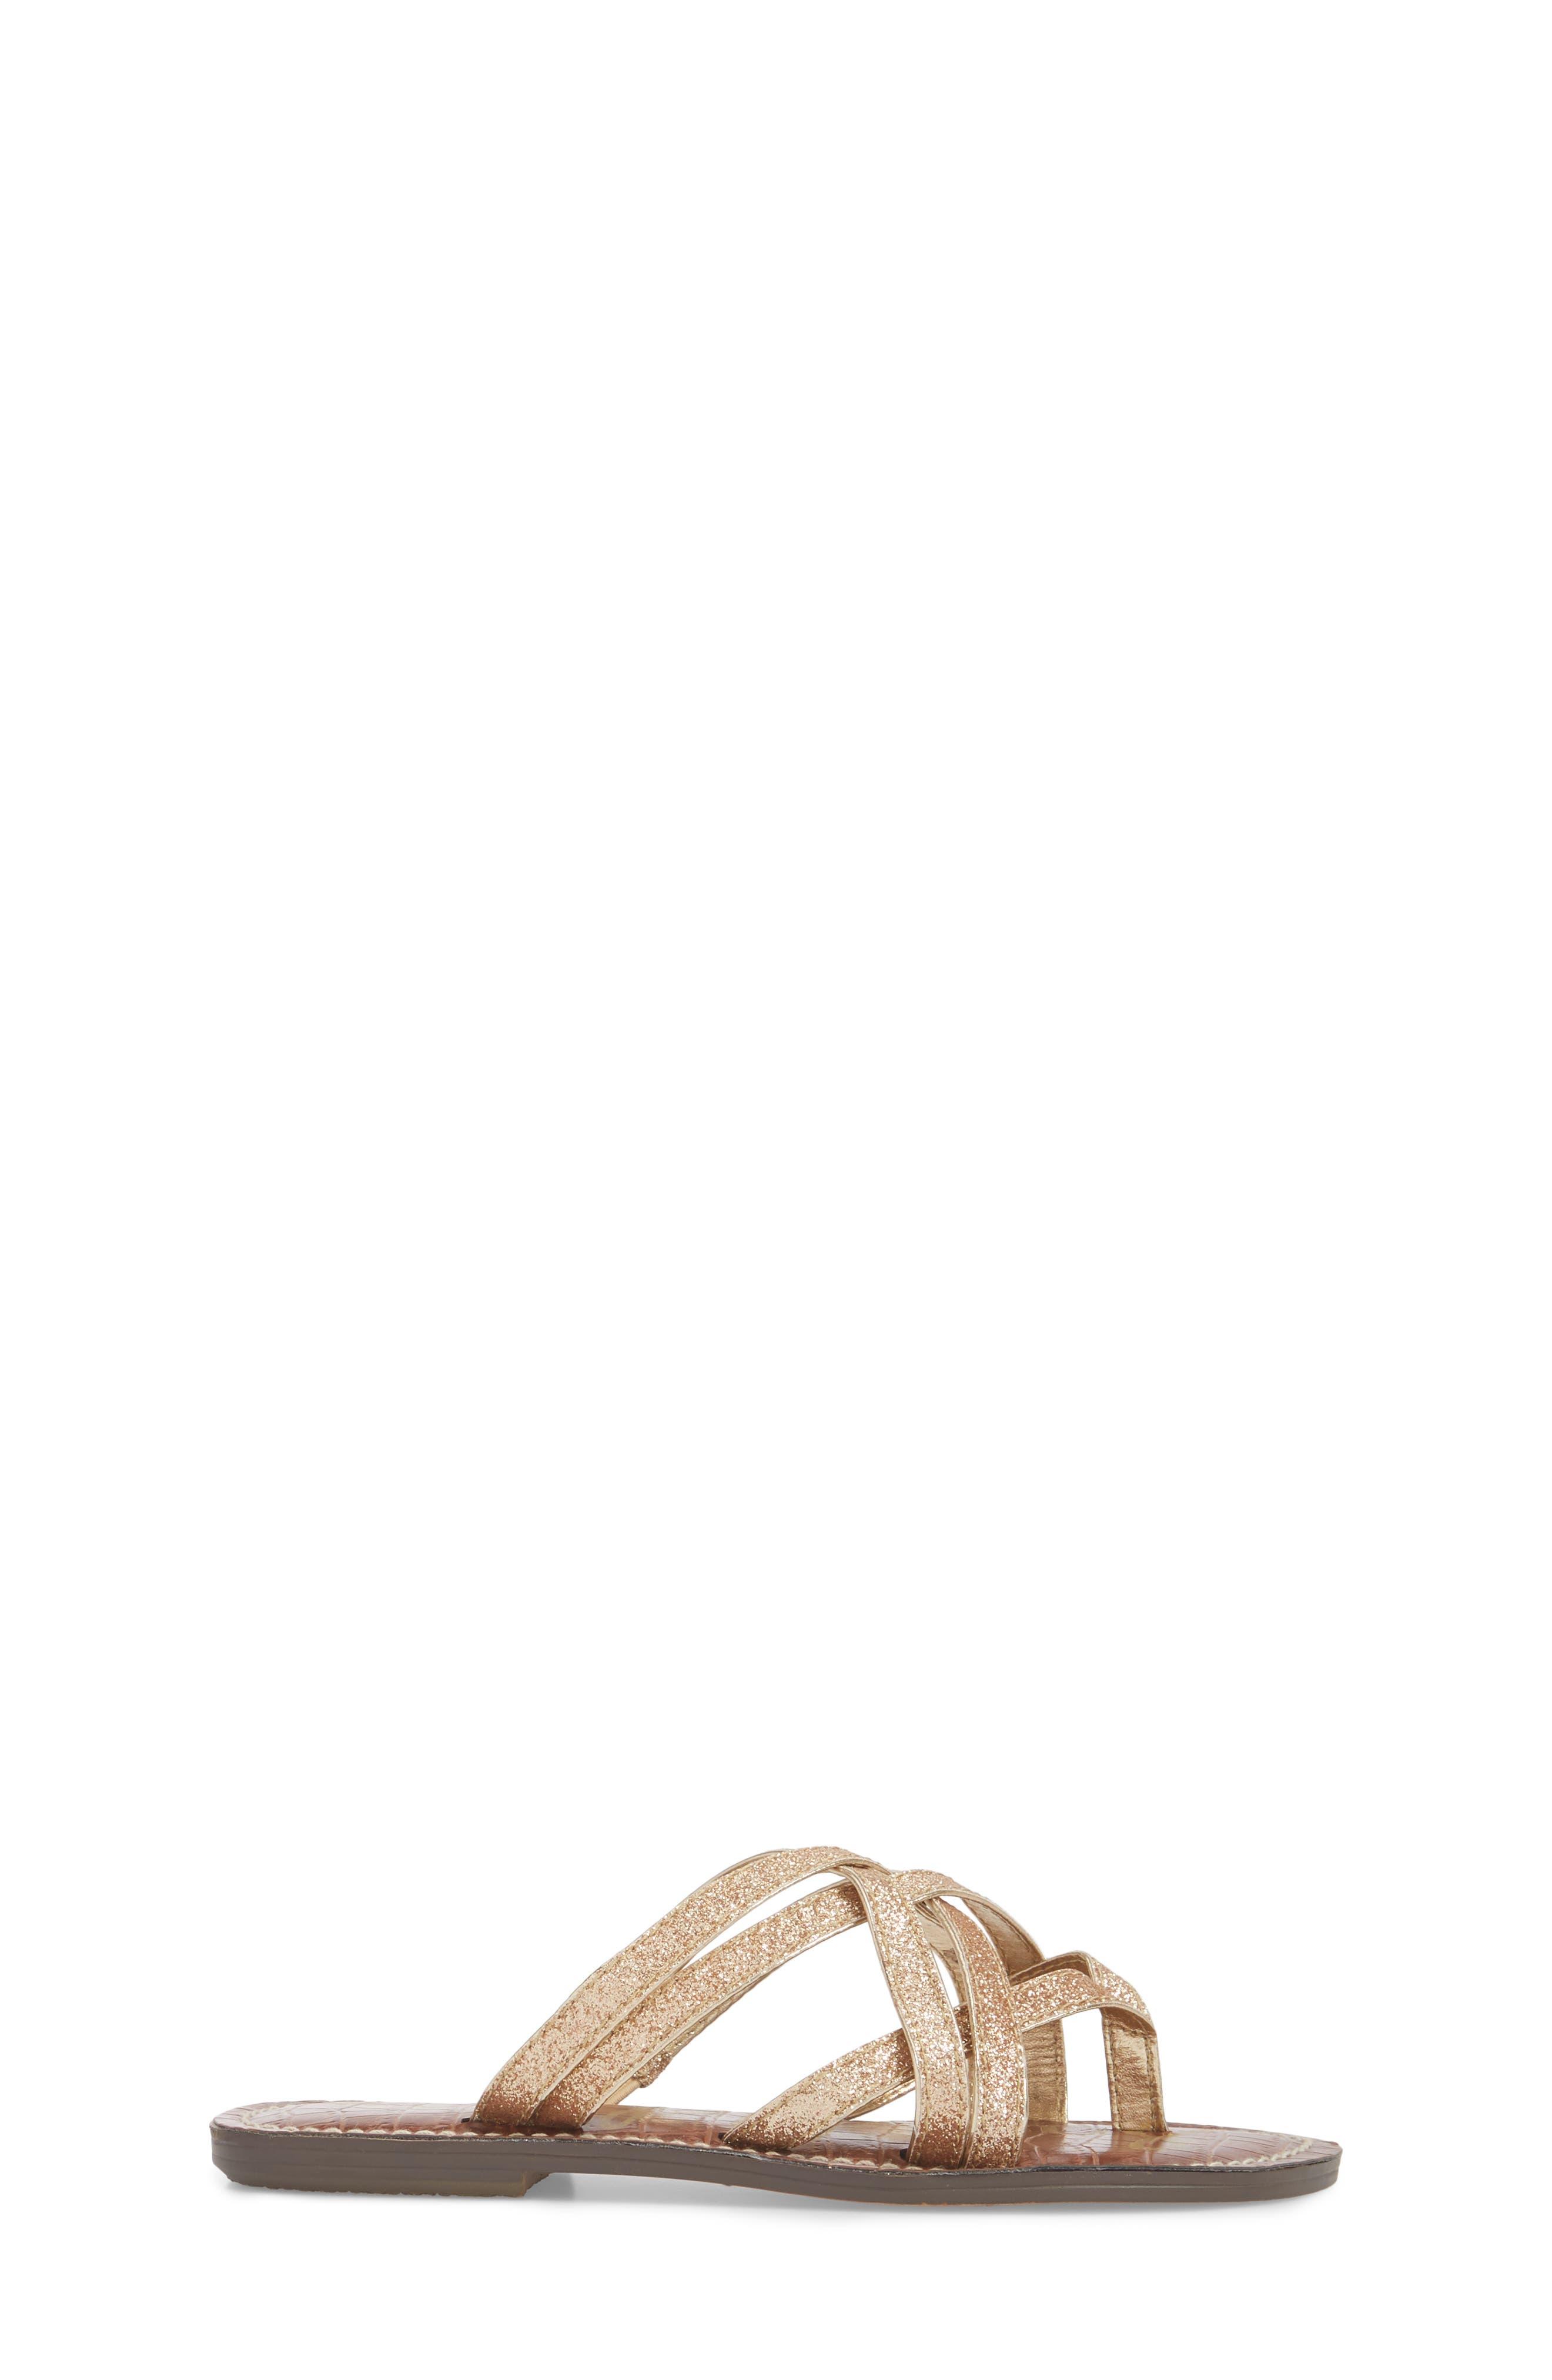 Georgette Glitter Flat Sandal,                             Alternate thumbnail 9, color,